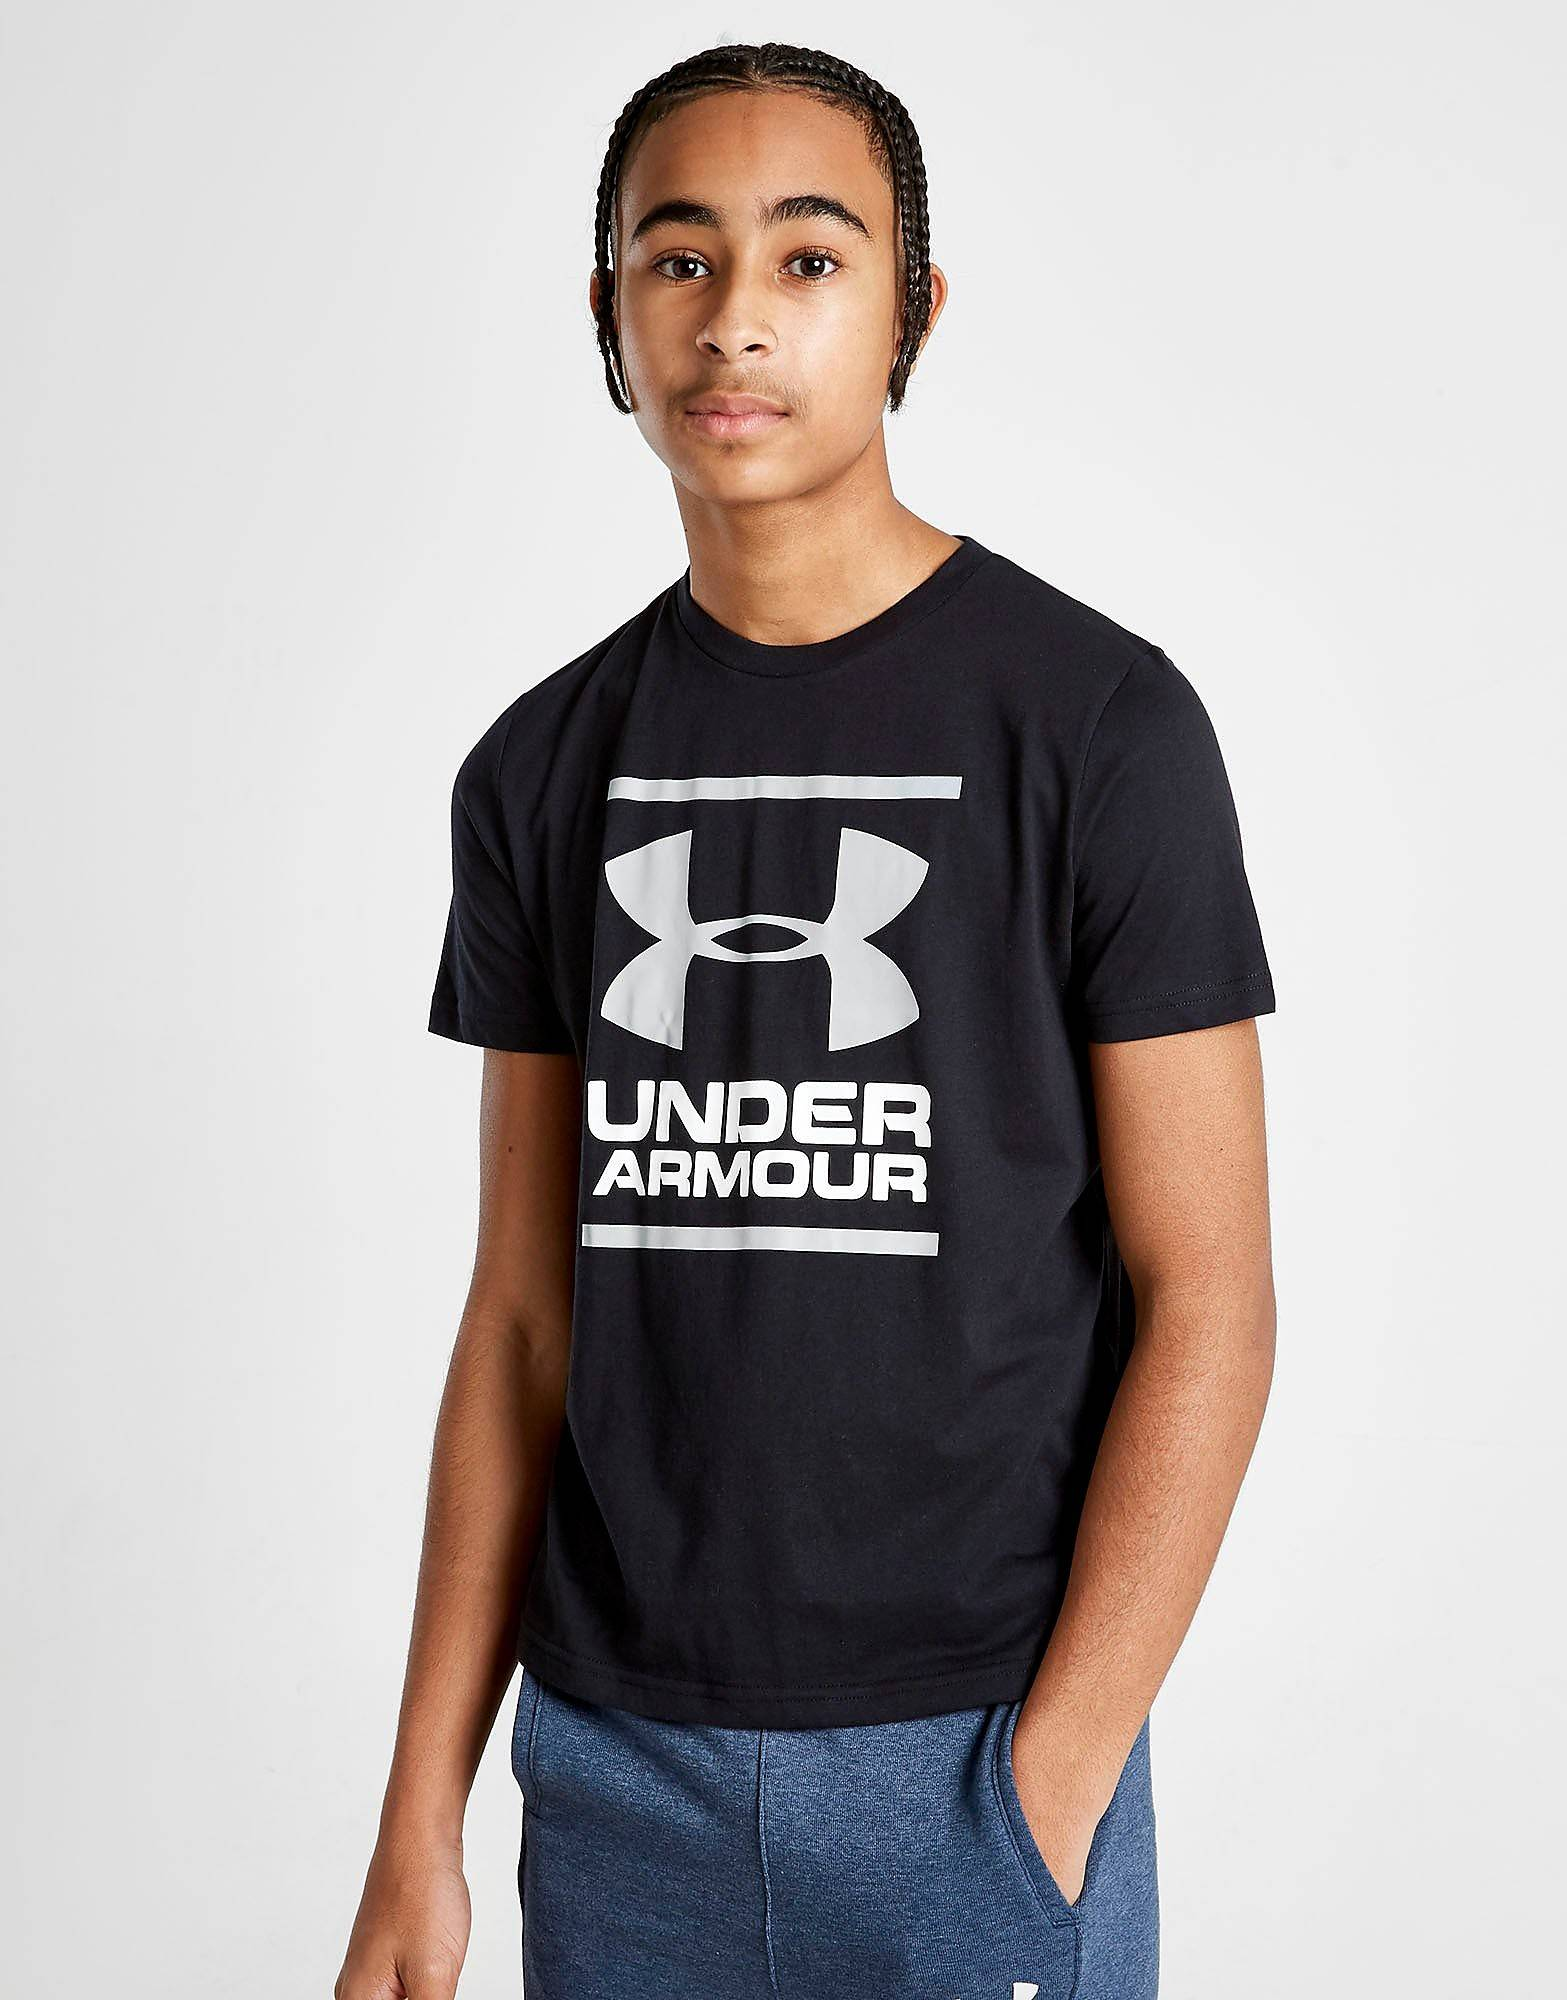 Under Armour Brand Stack T-Paita Juniorit - Only at JD - Kids, Musta